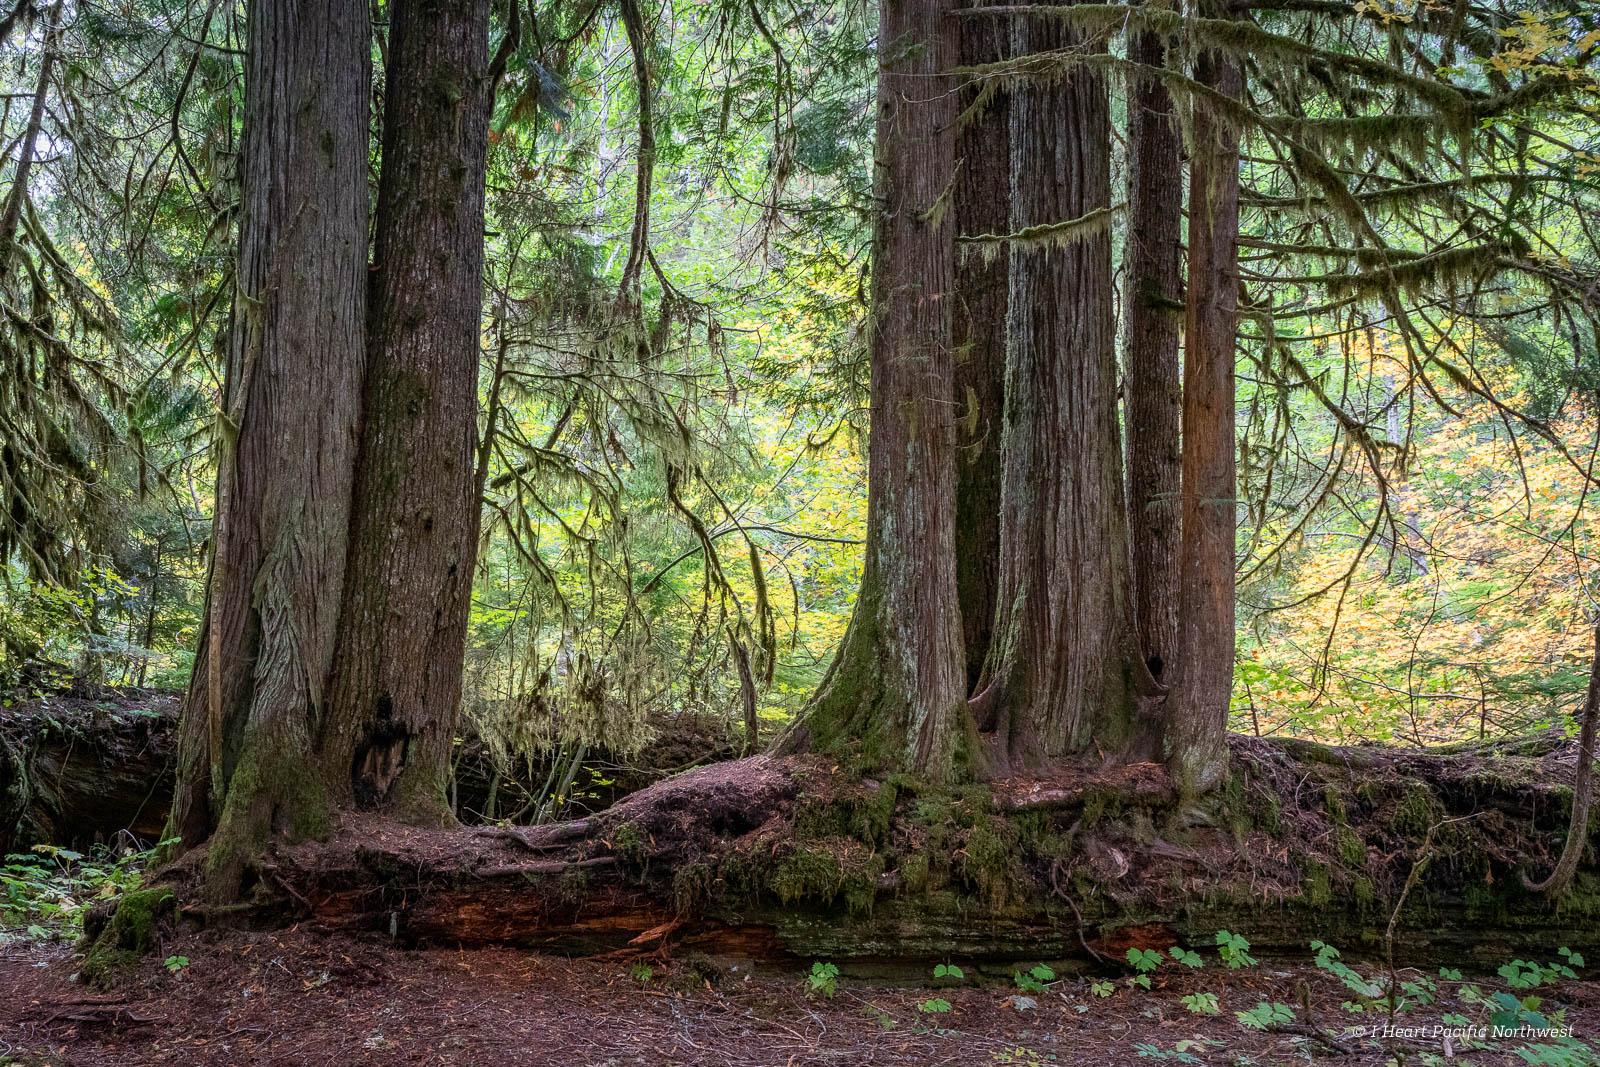 Mount Rainier National Park - Grove of Patriarchs hike